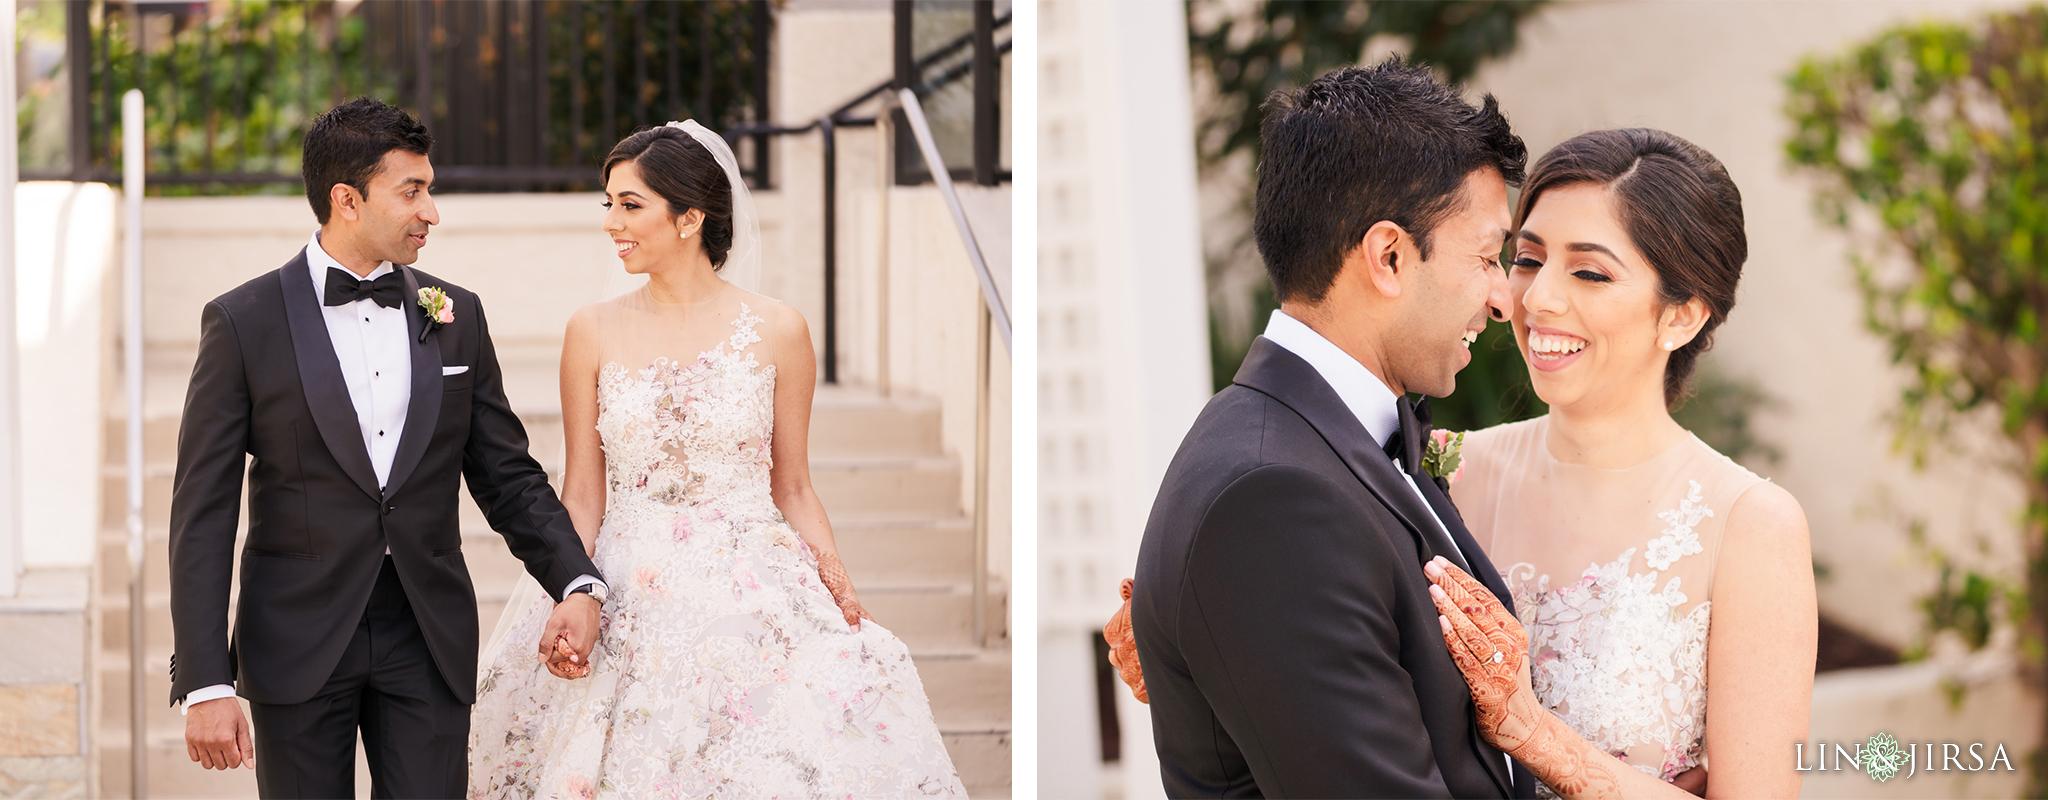 08 Newport Beach Marriott Indian Wedding Photography 1